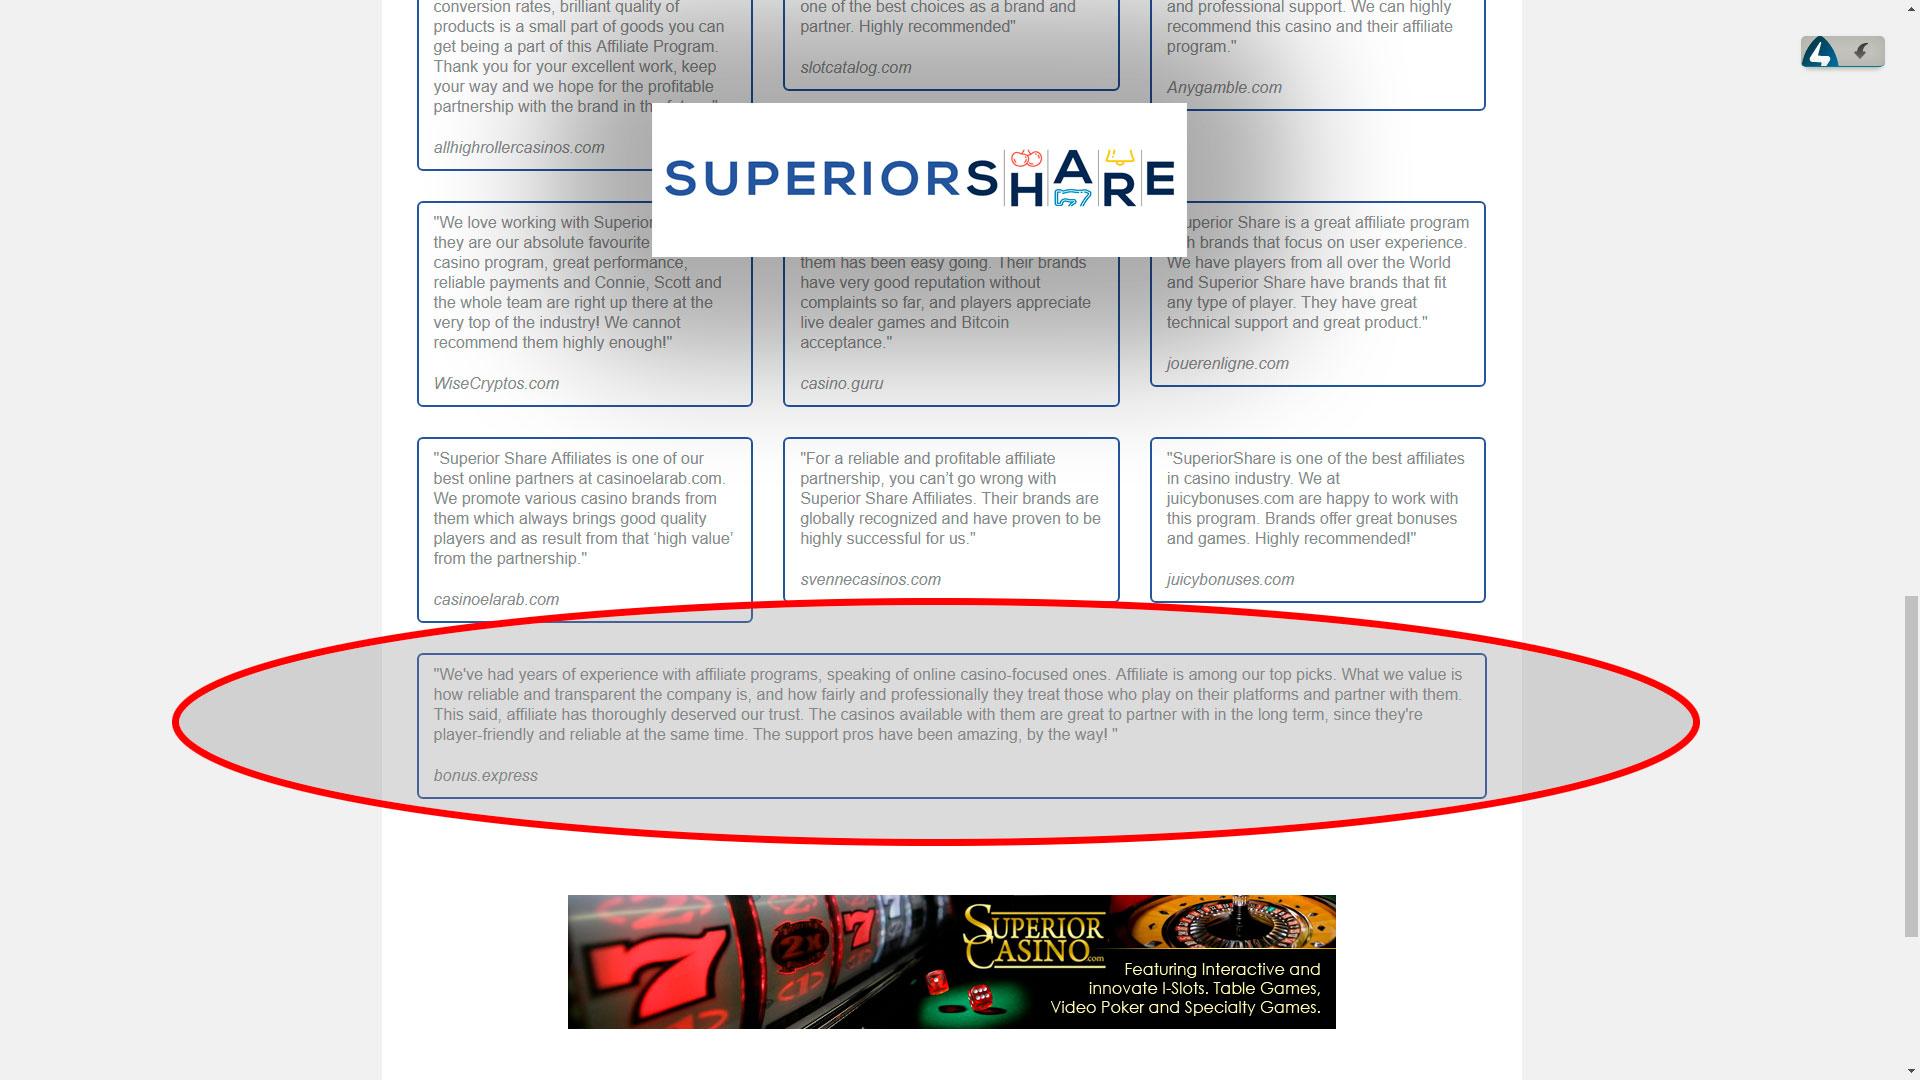 Superior Share